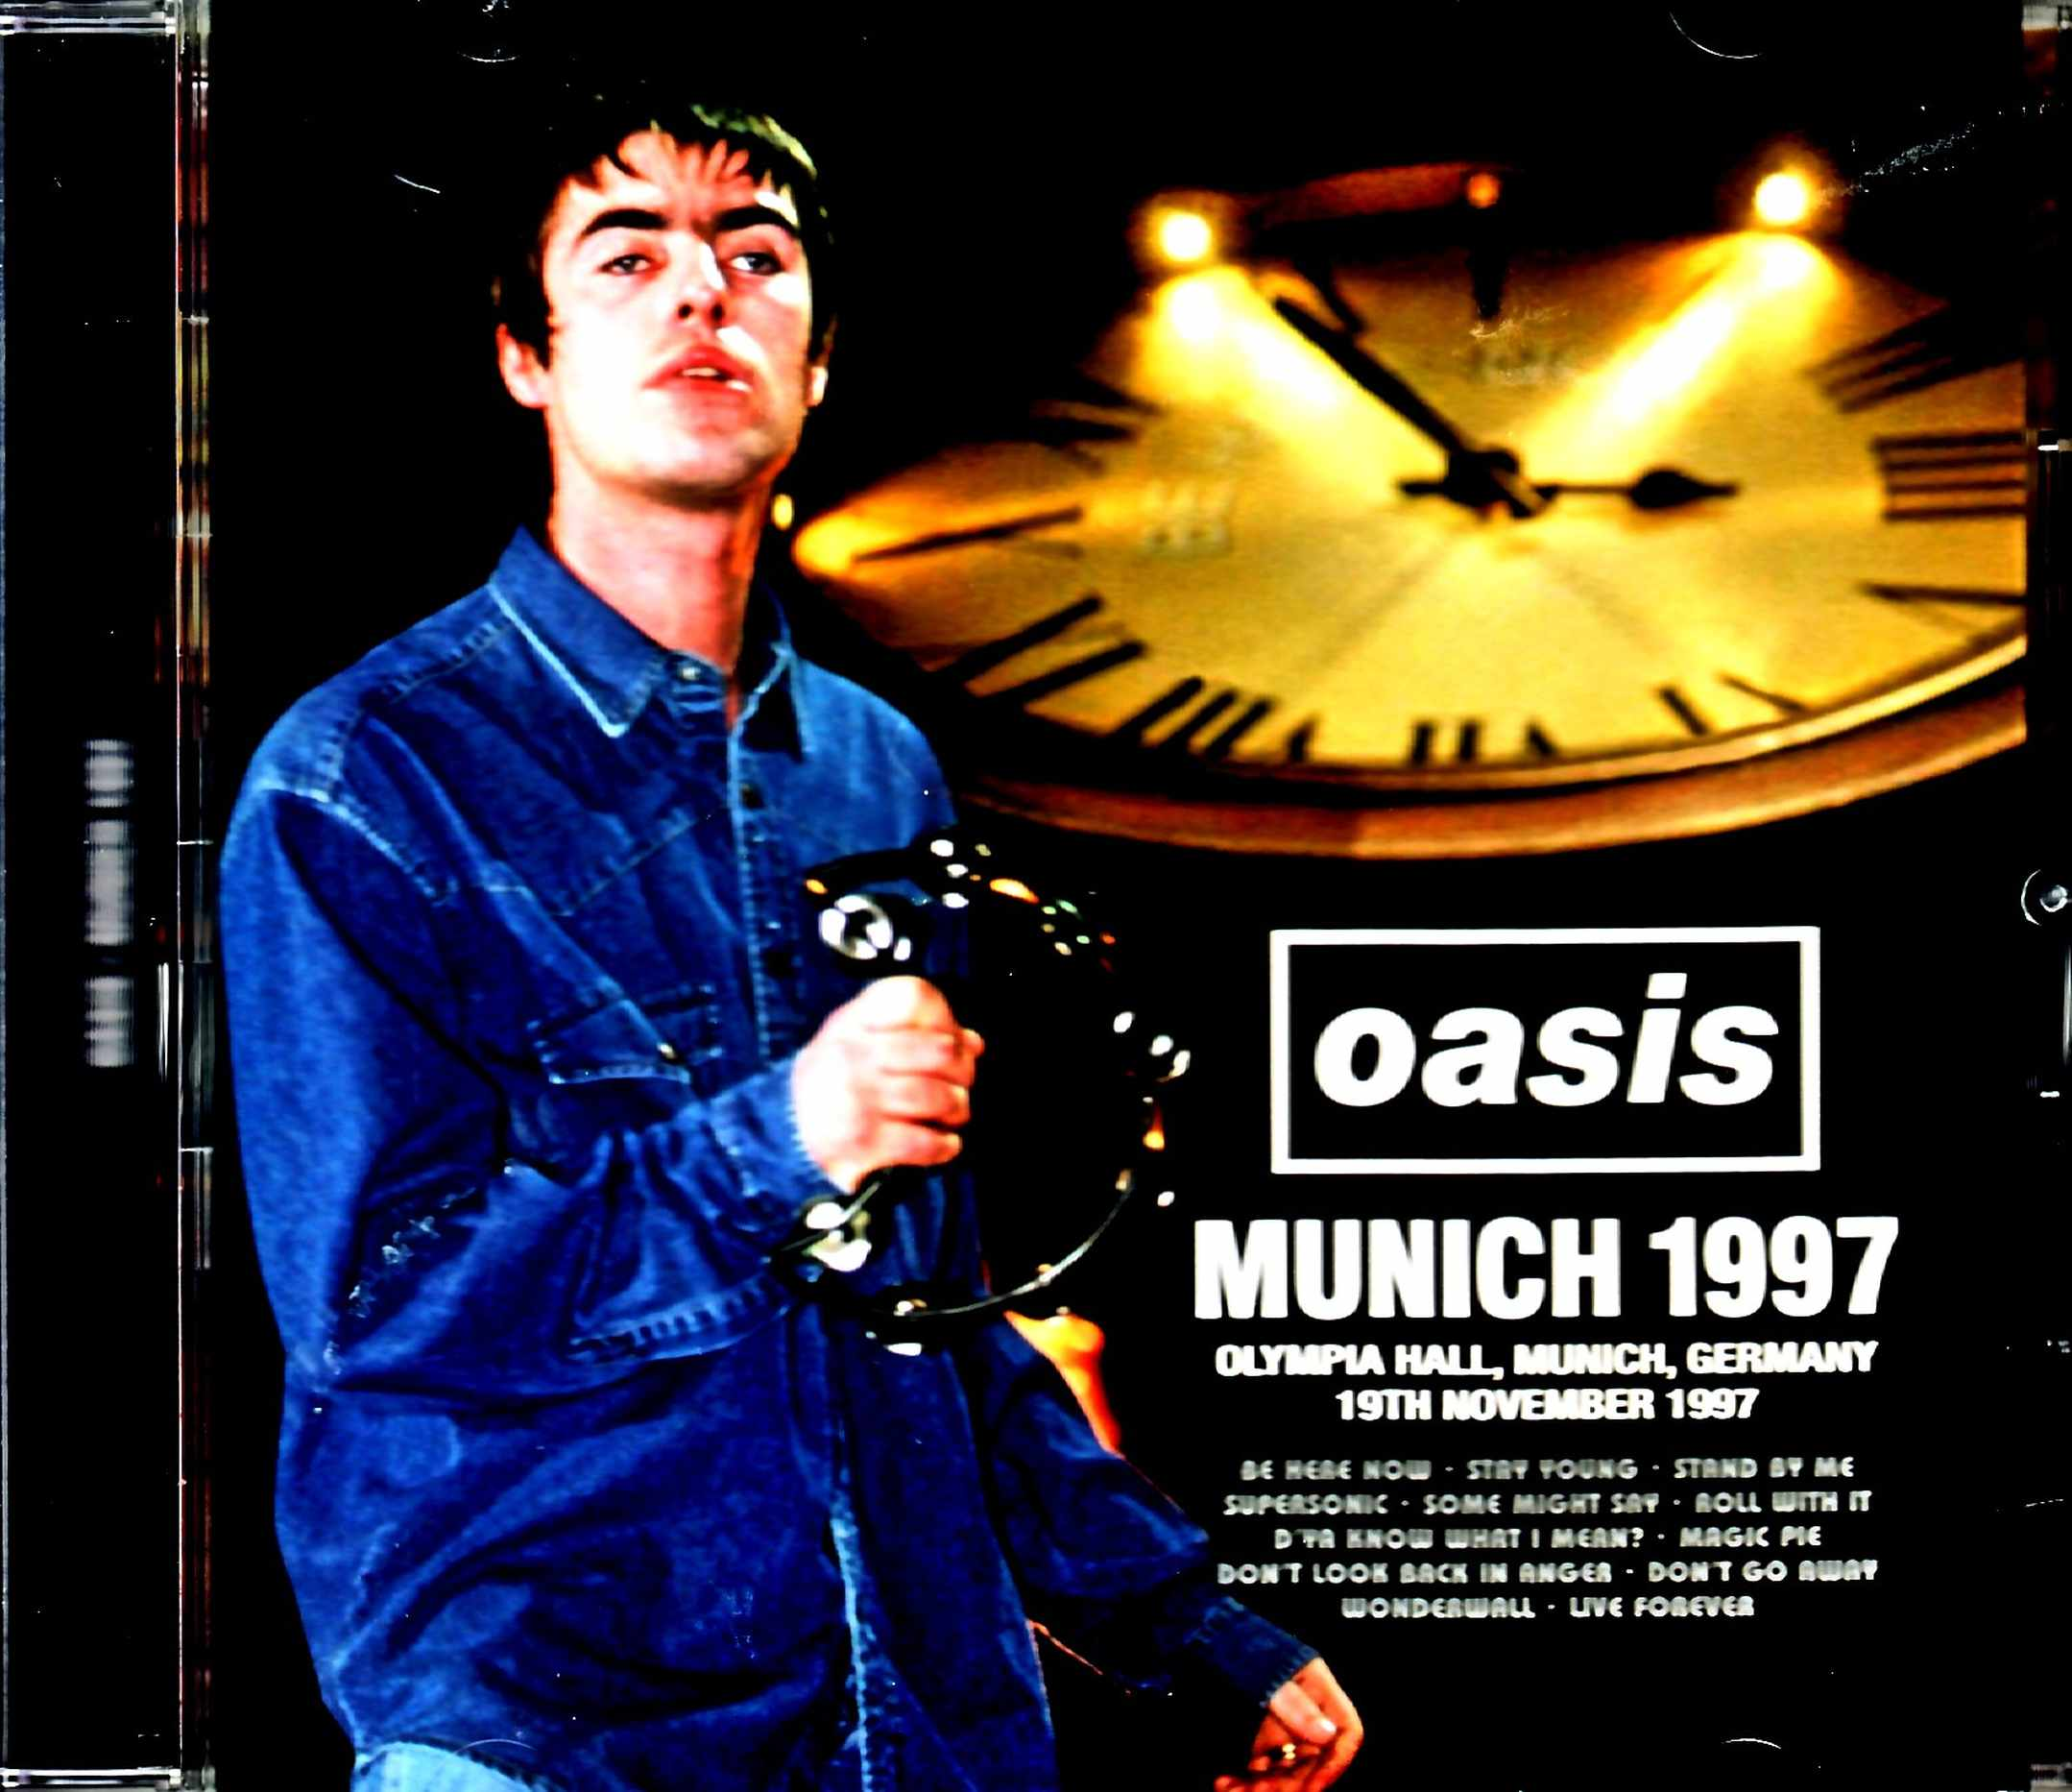 Oasis オアシス/Germany 11.19.1997 Soundboard Recording